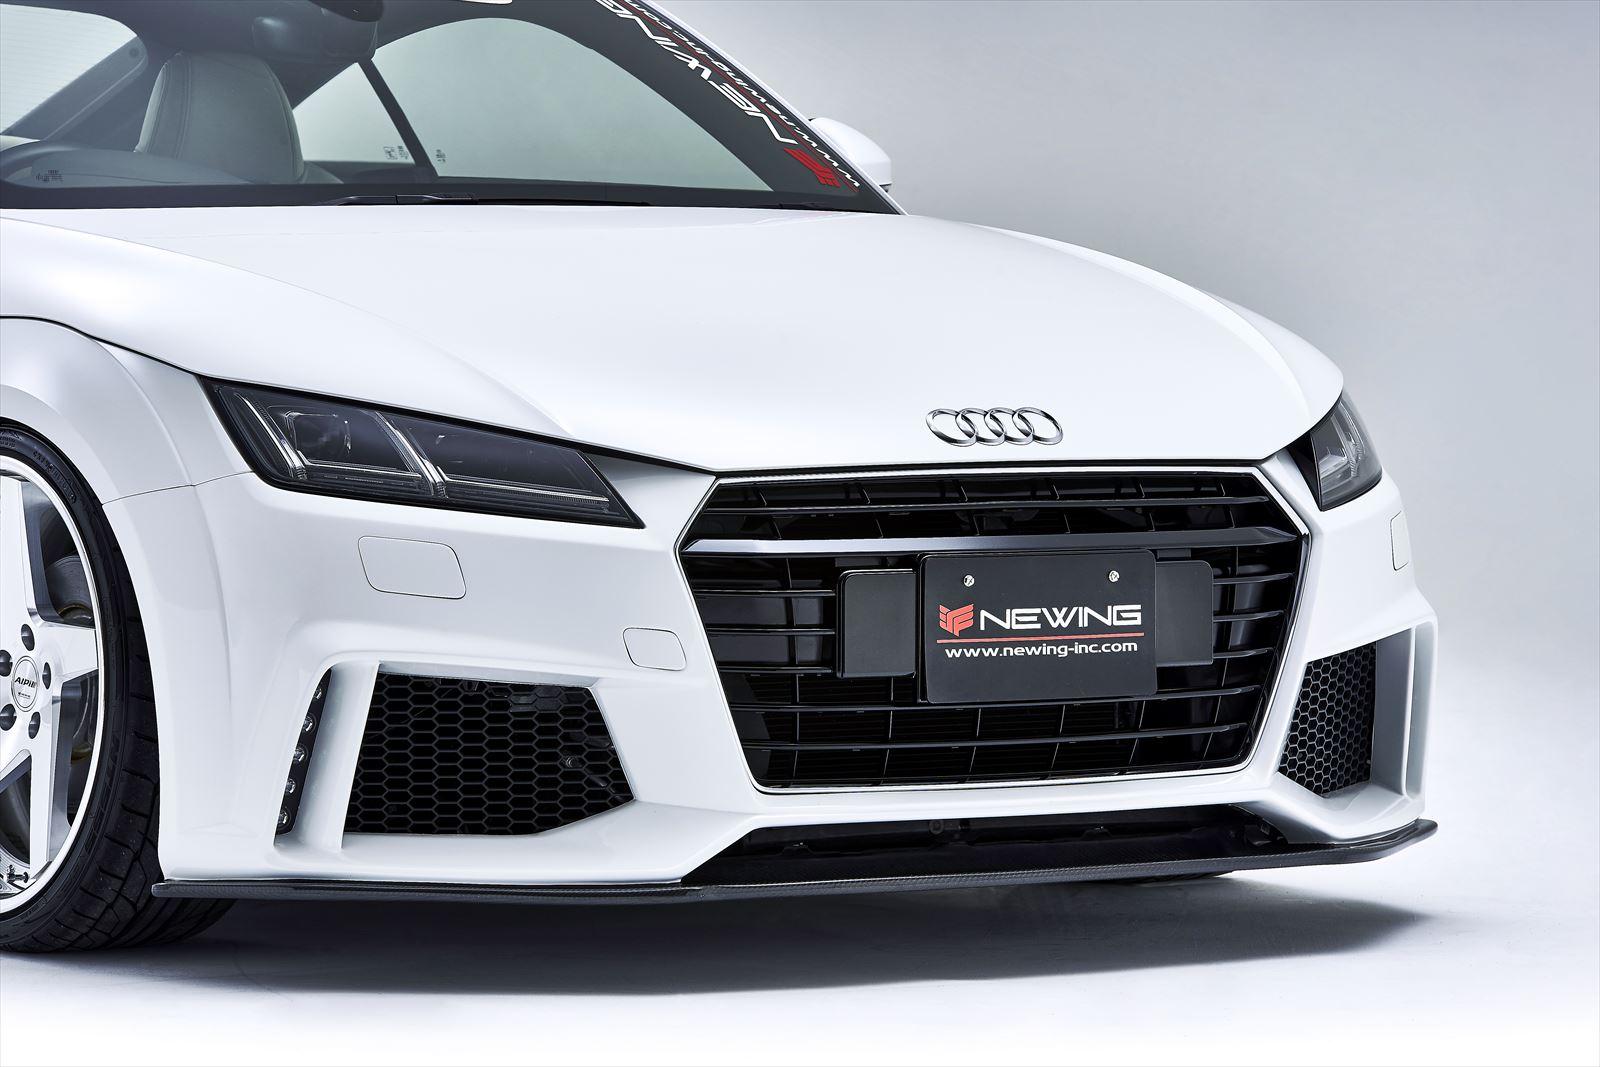 NEWING Alpil Audi TT Complete Bodykit